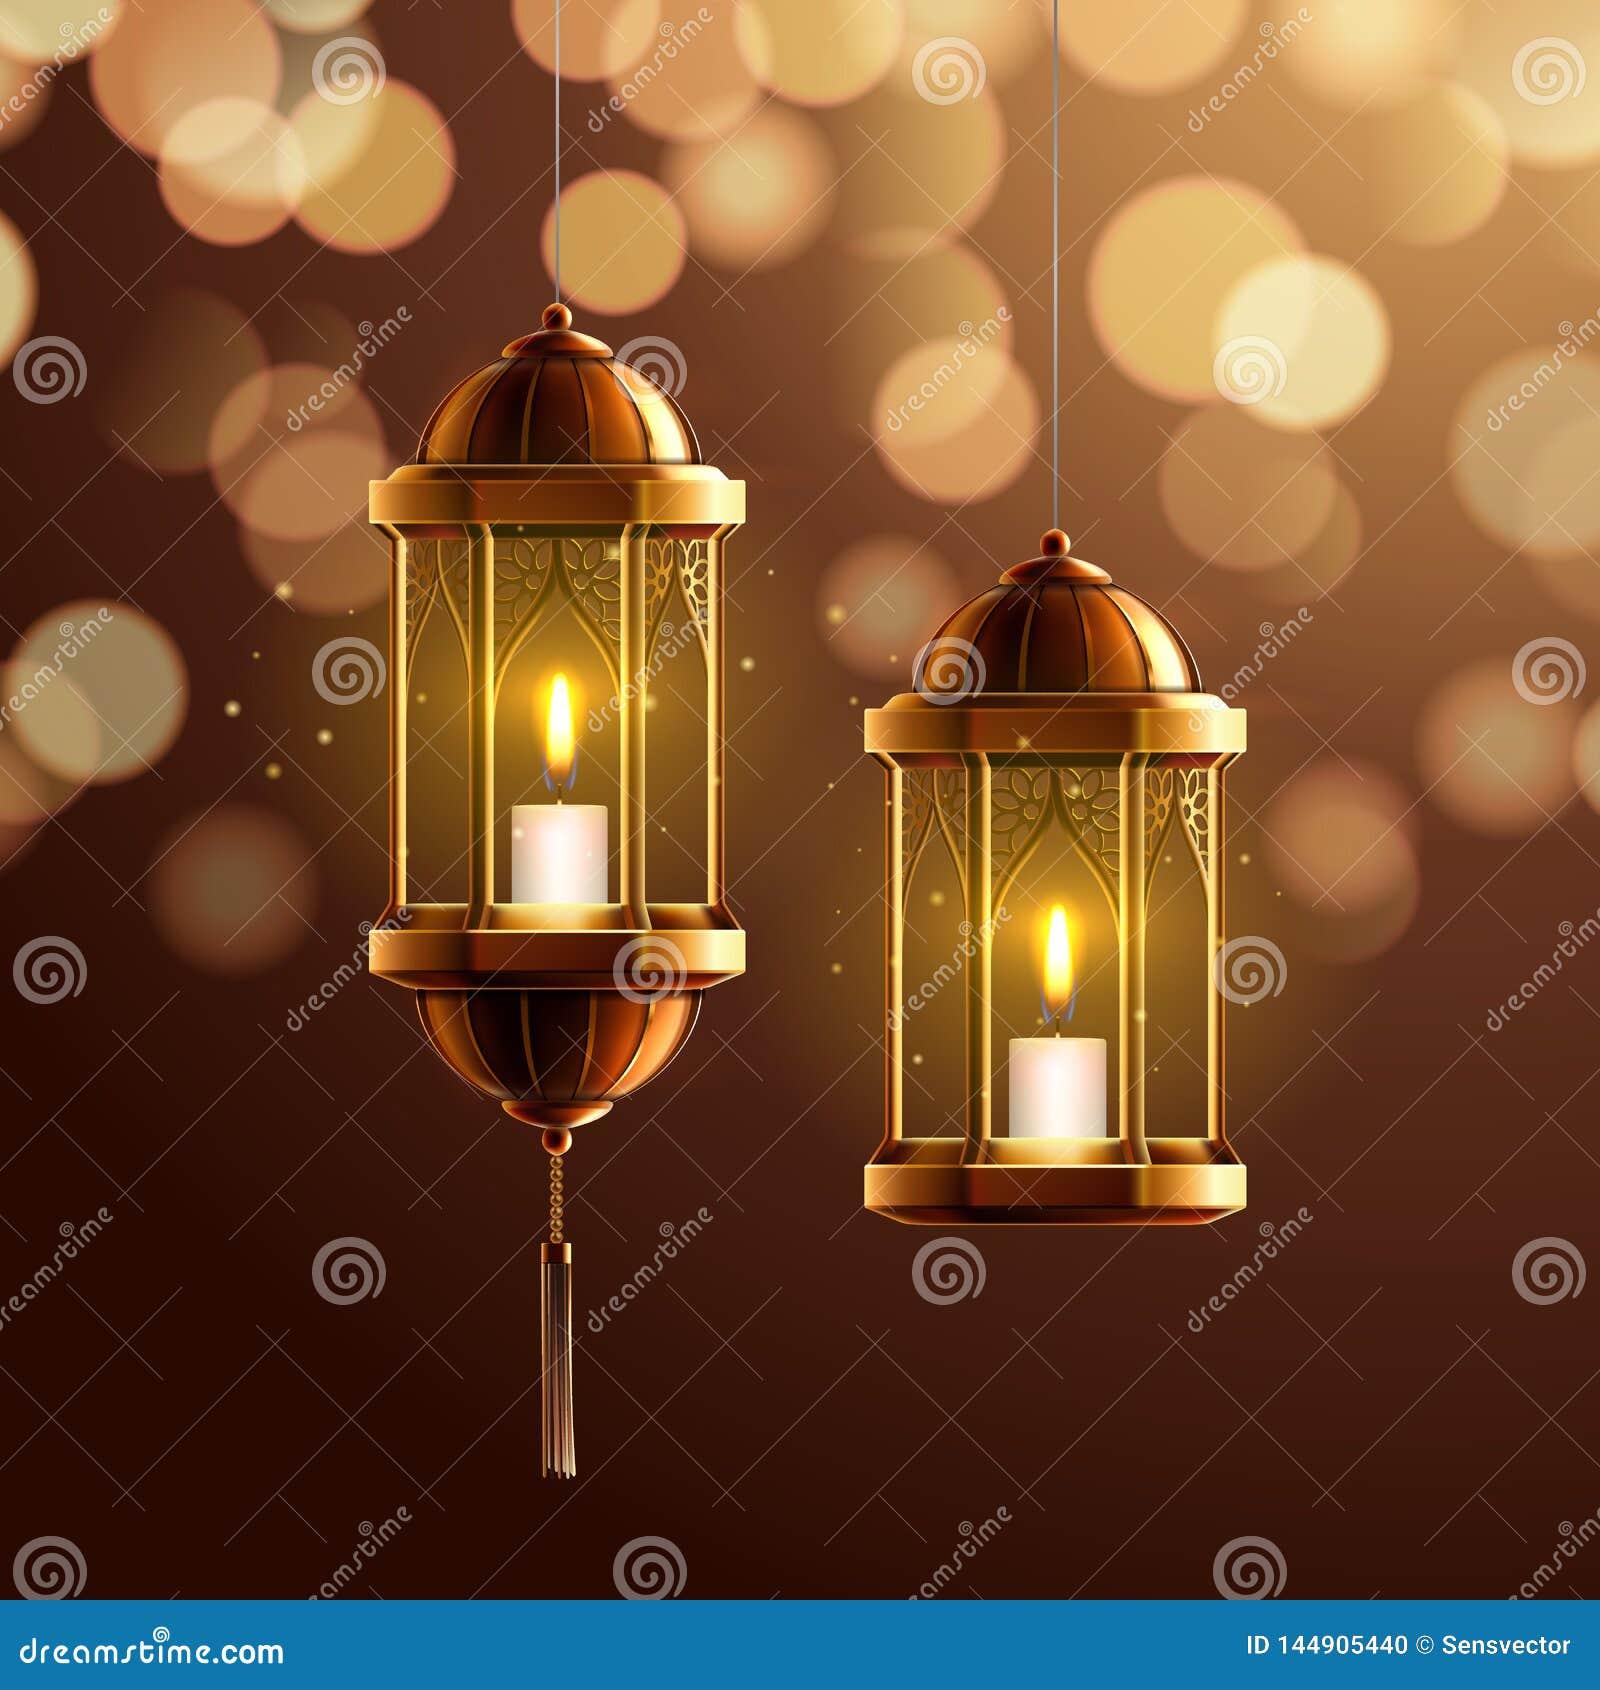 Glowing fanous or vintage fanoos, hanging lantern